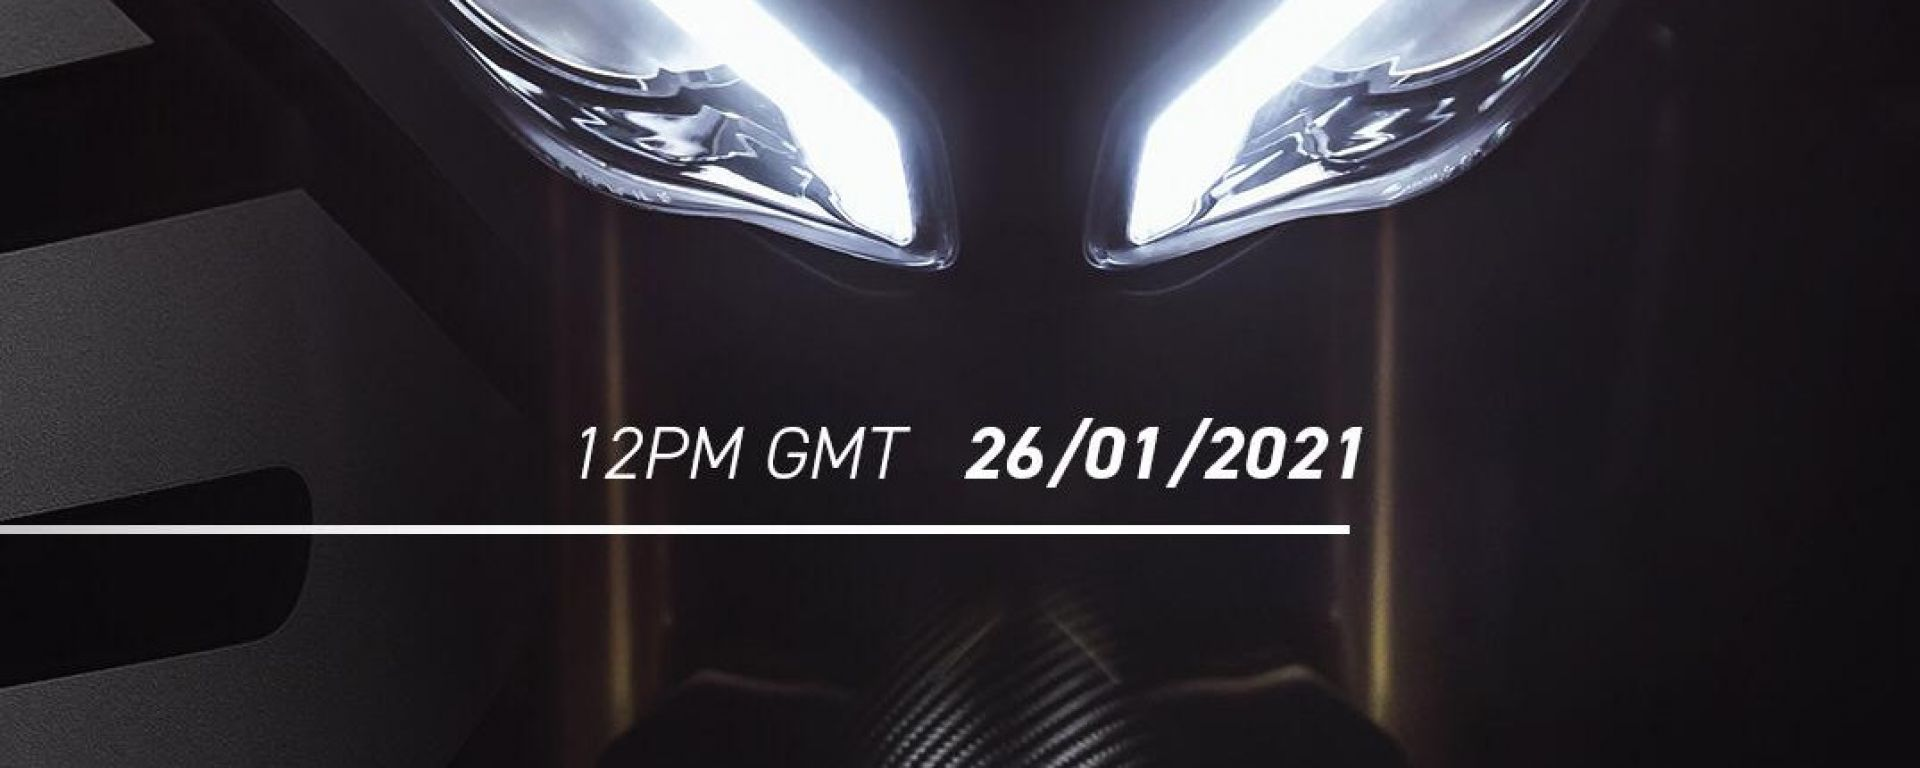 Triumph Speed Triple RS: verrà presentata il 26 gennaio